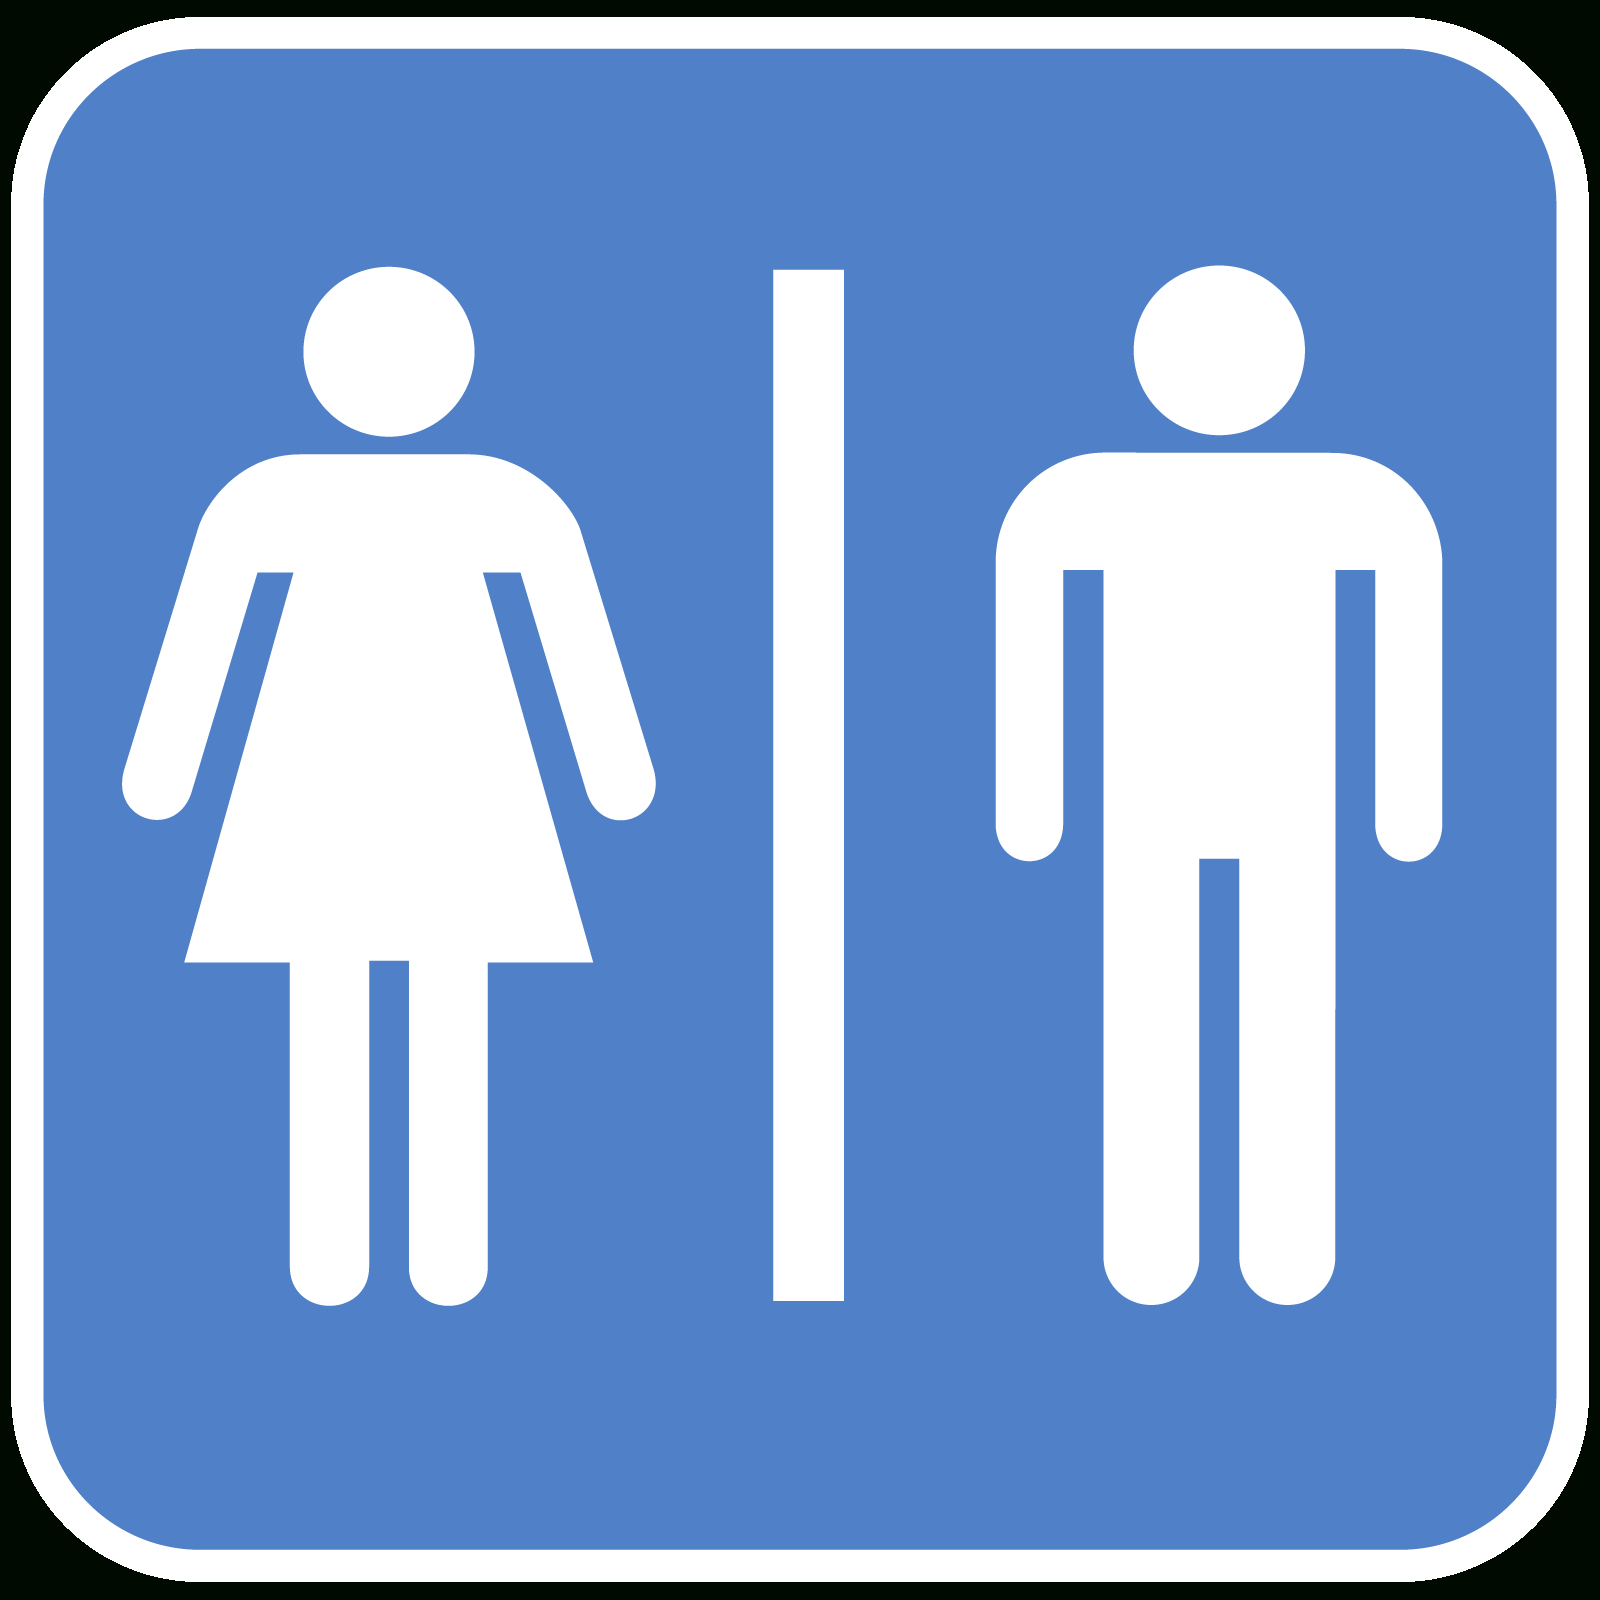 Free Printable Restroom Signs, Download Free Clip Art, Free Clip Art - Free Printable No Restroom Signs